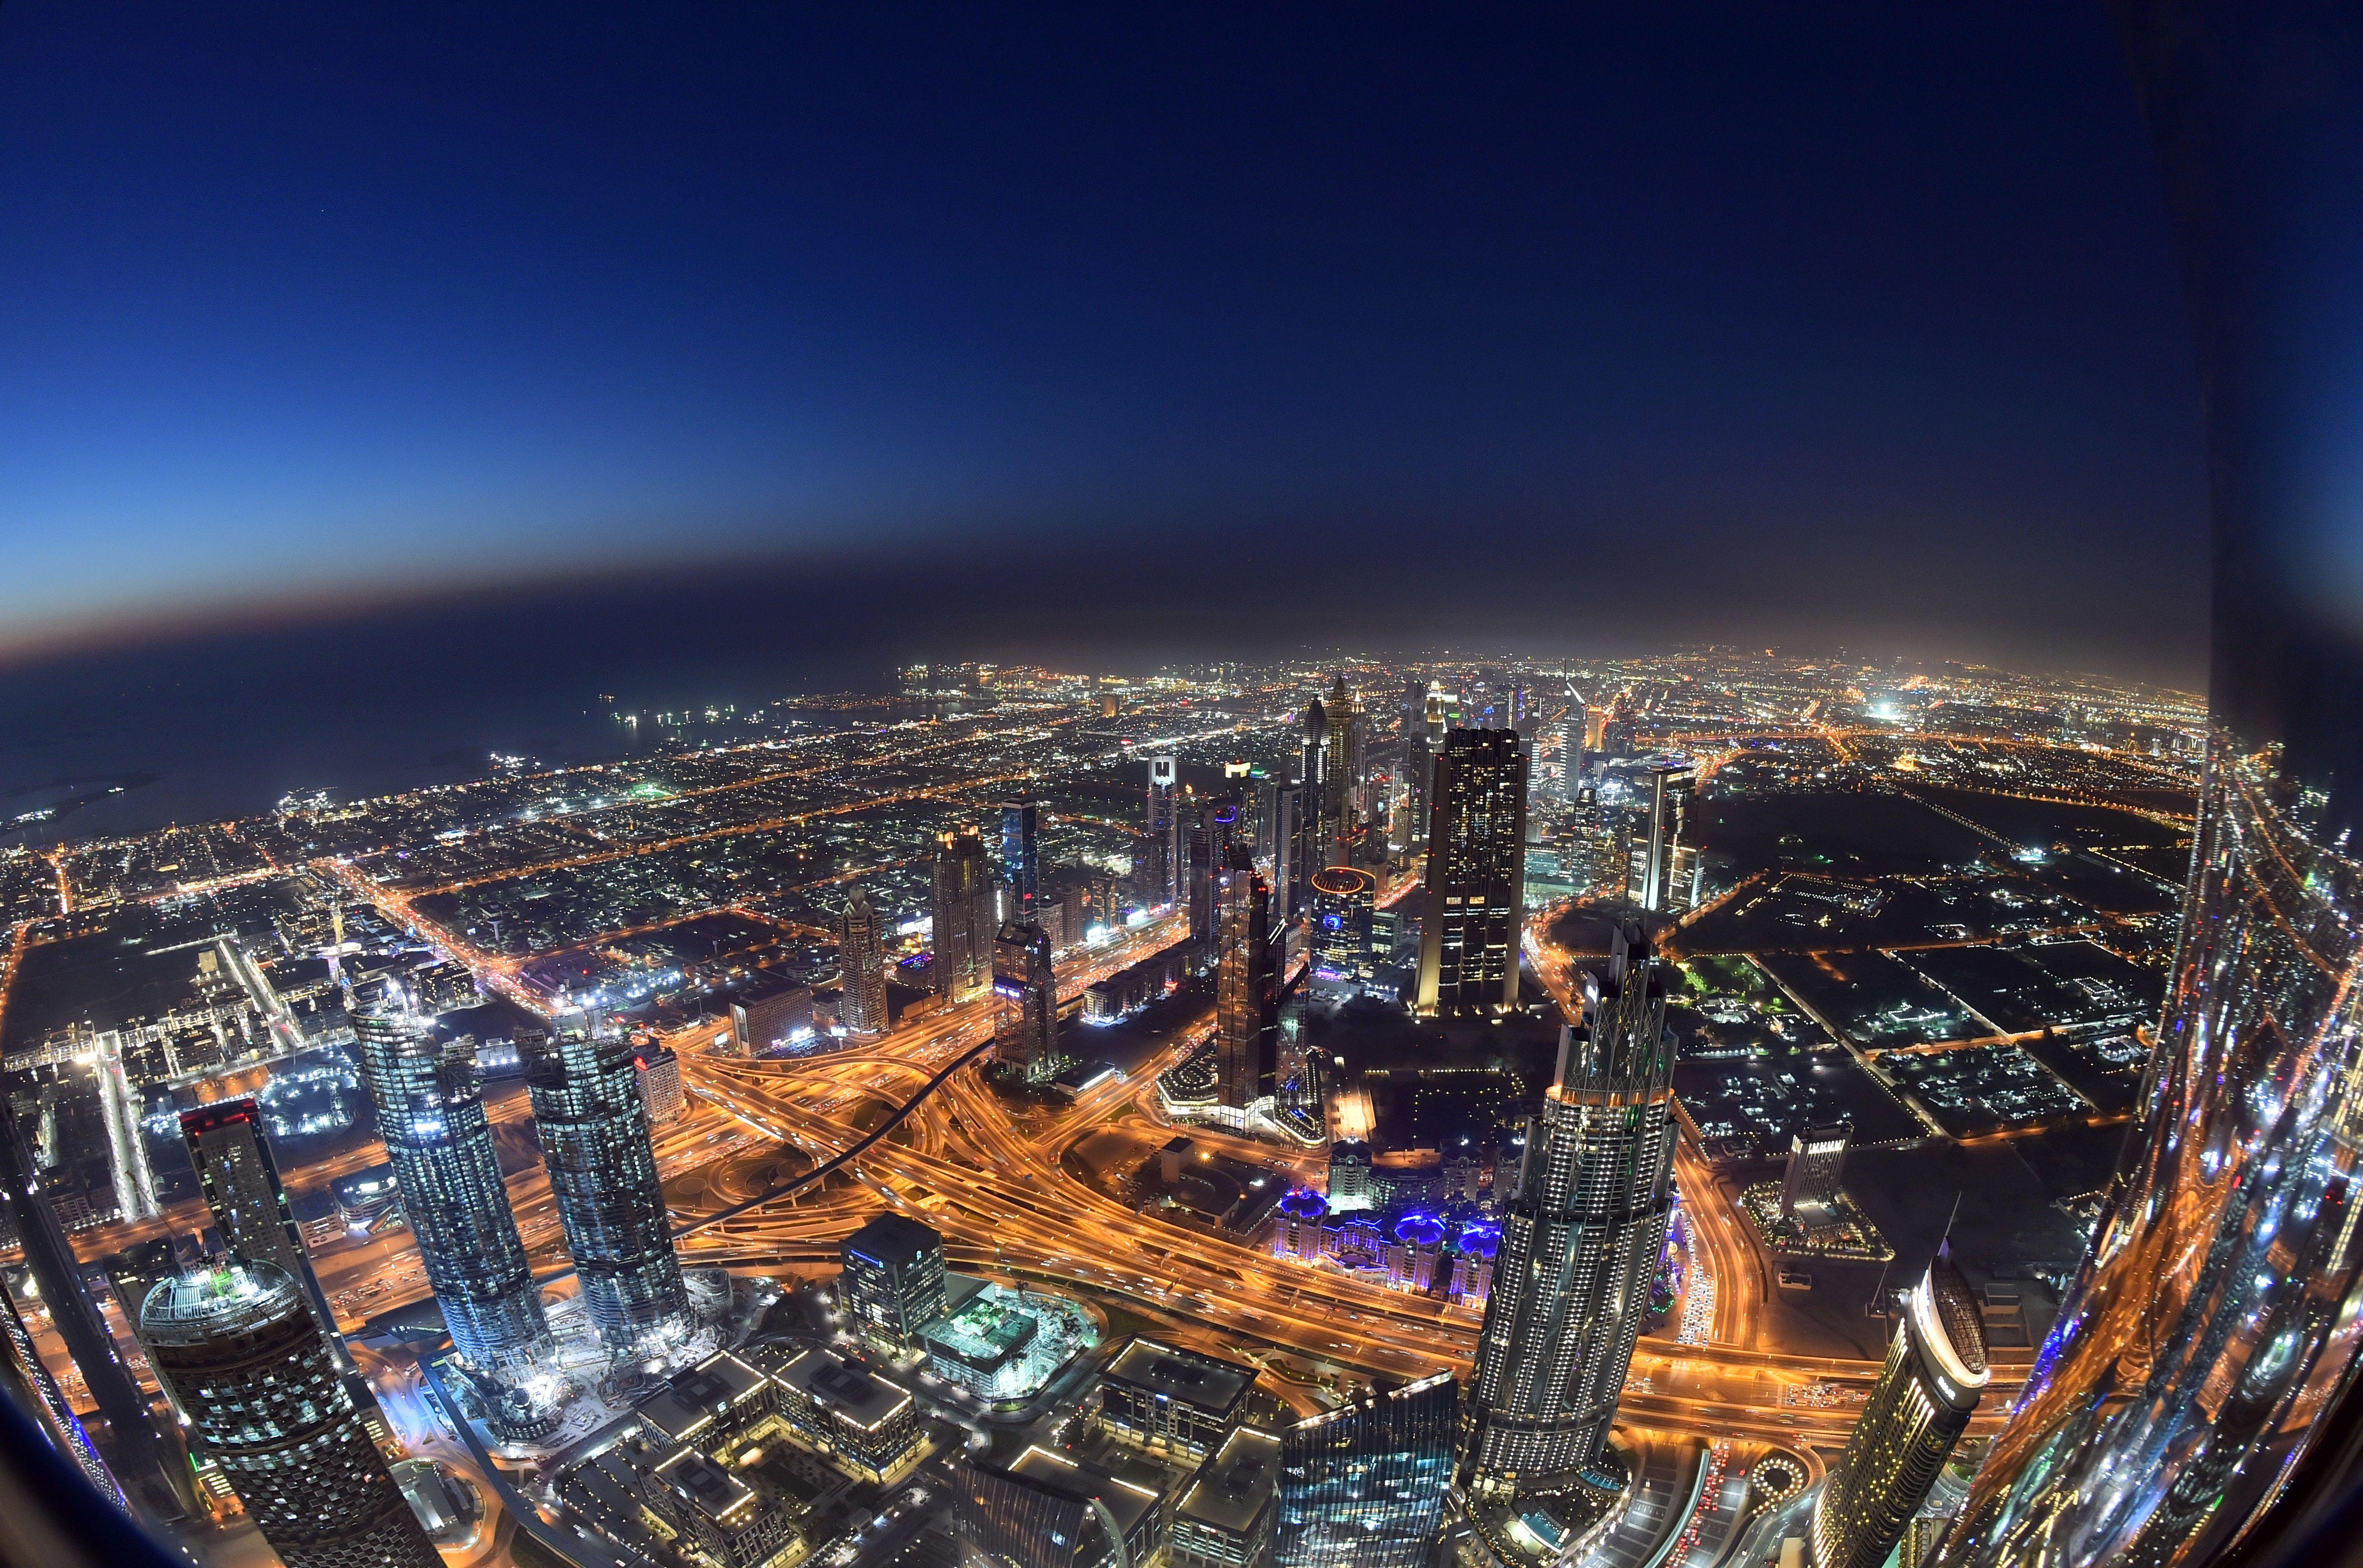 Dubai's Burj Khalifa: A look inside the